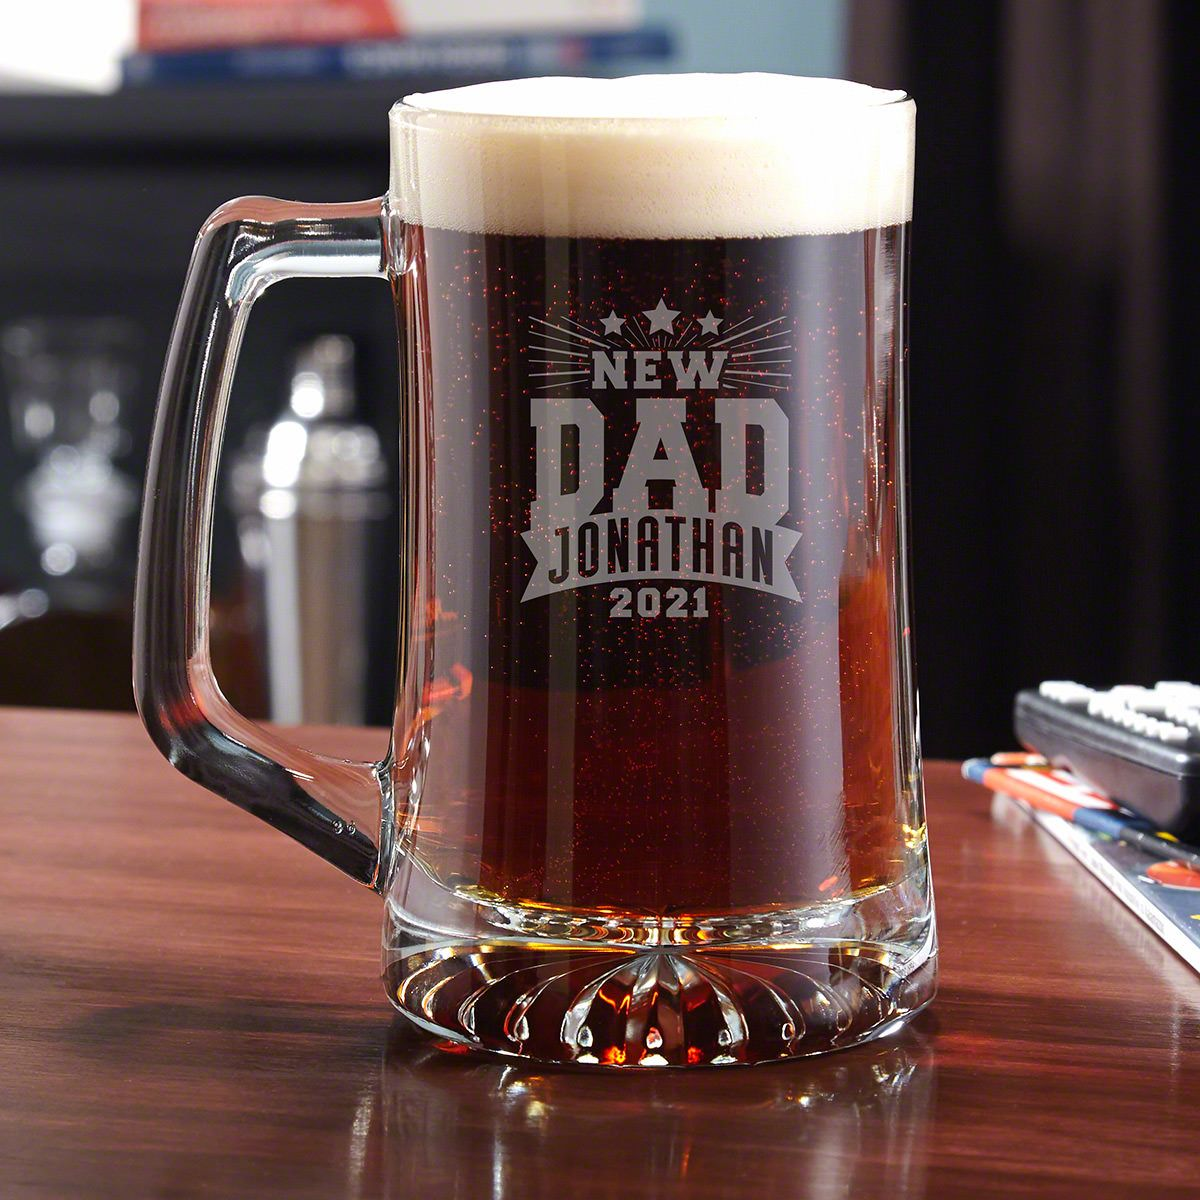 Rockstar New Dad Engraved Beer Mug - Gift for New Dad